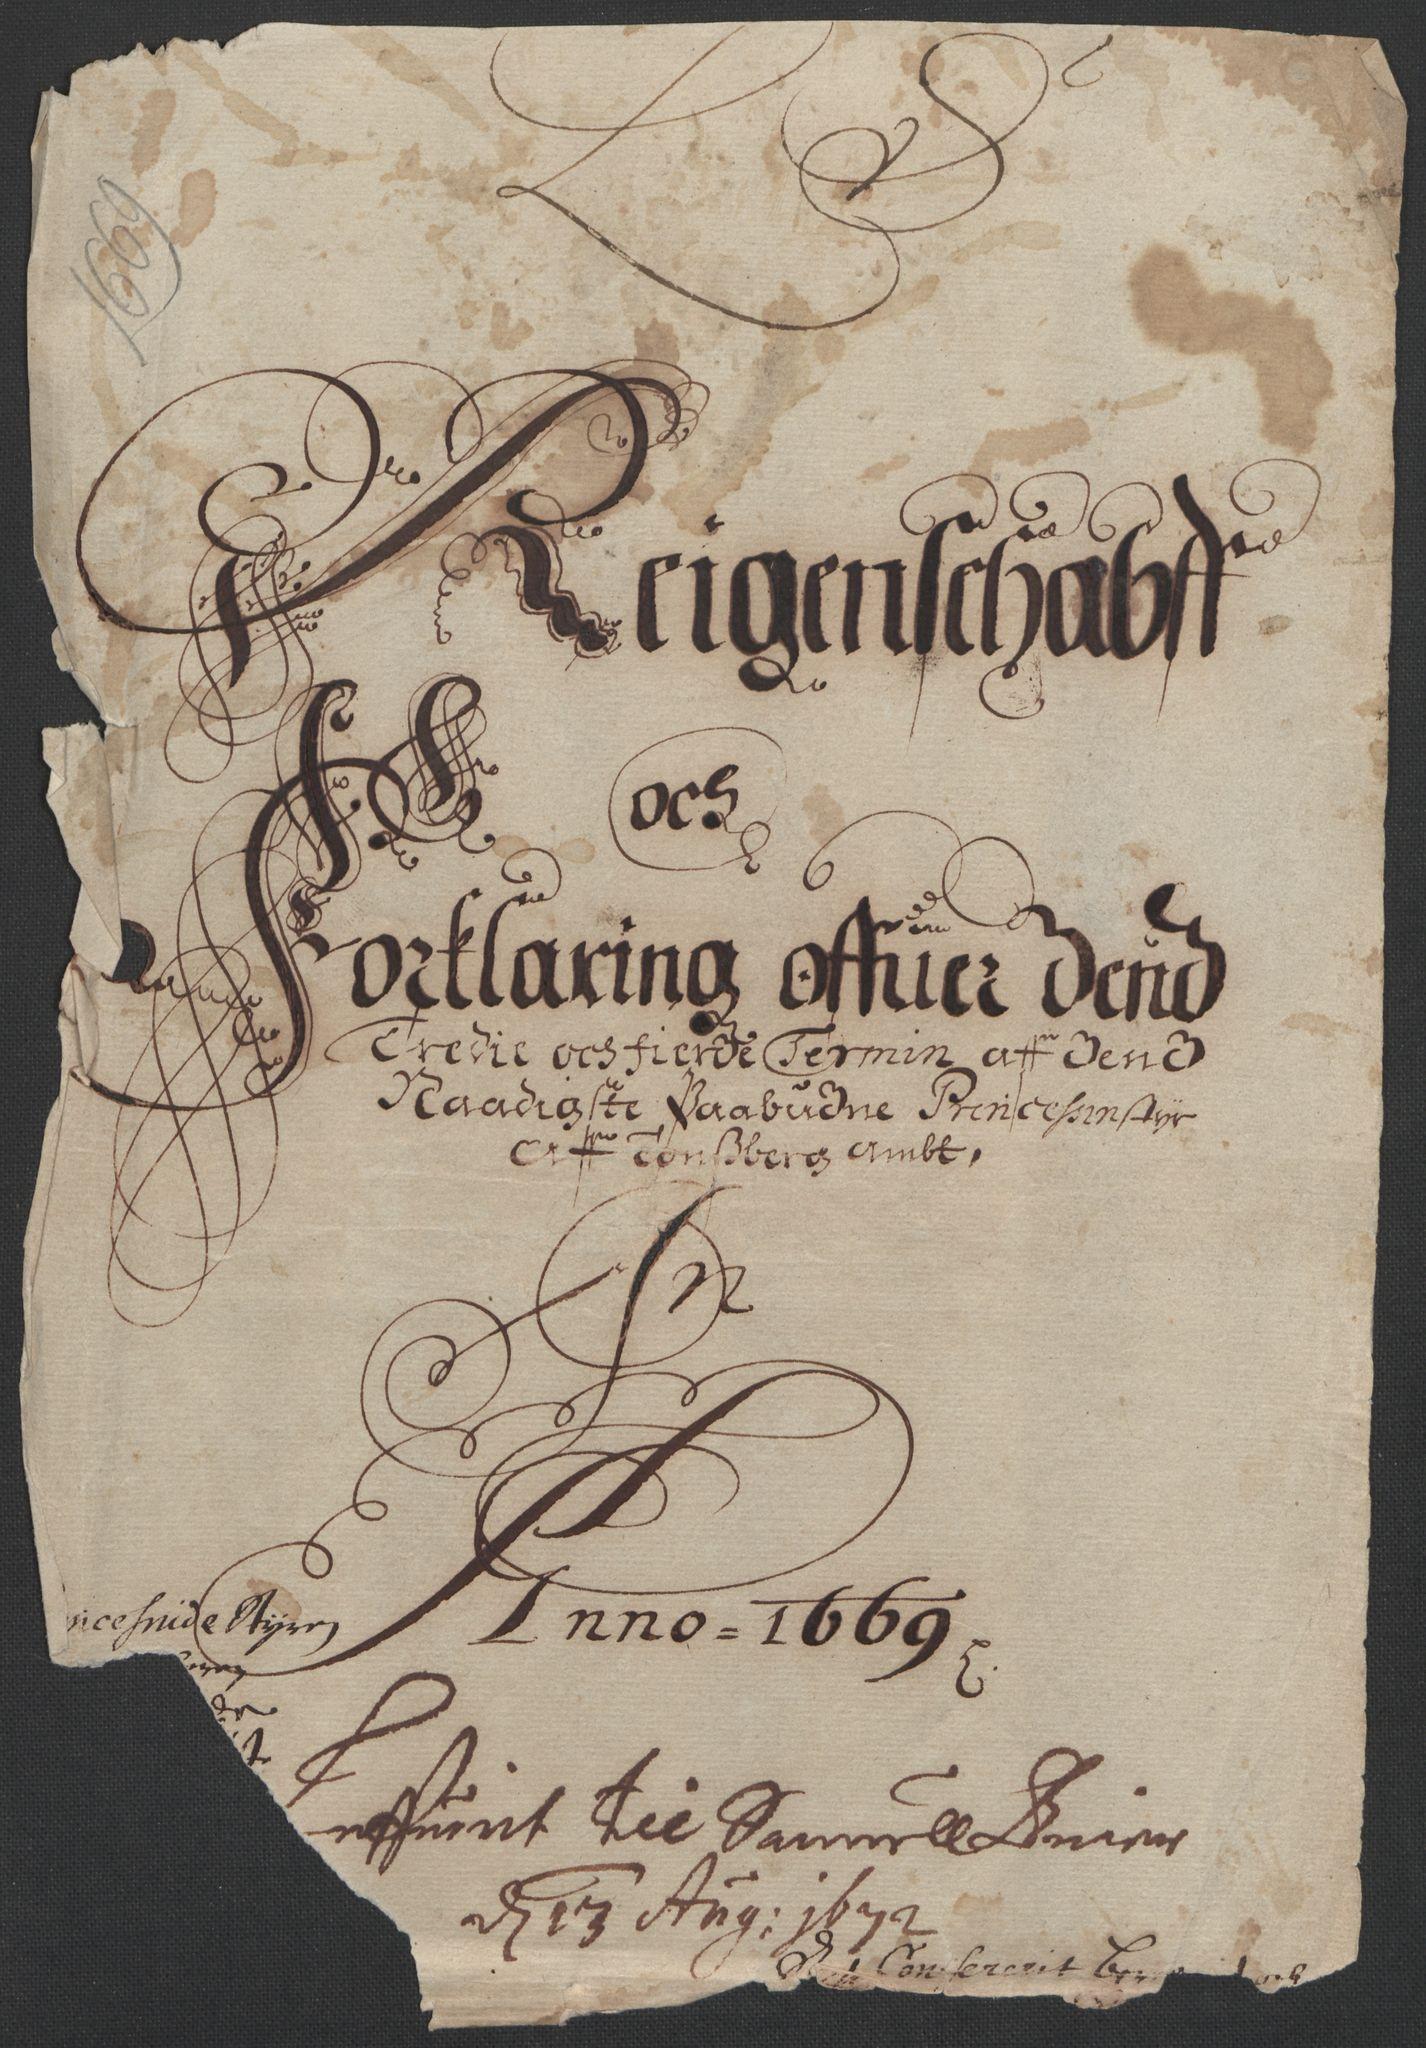 RA, Rentekammeret inntil 1814, Reviderte regnskaper, Fogderegnskap, R32/L1840: Fogderegnskap Jarlsberg grevskap, 1664-1673, s. 305